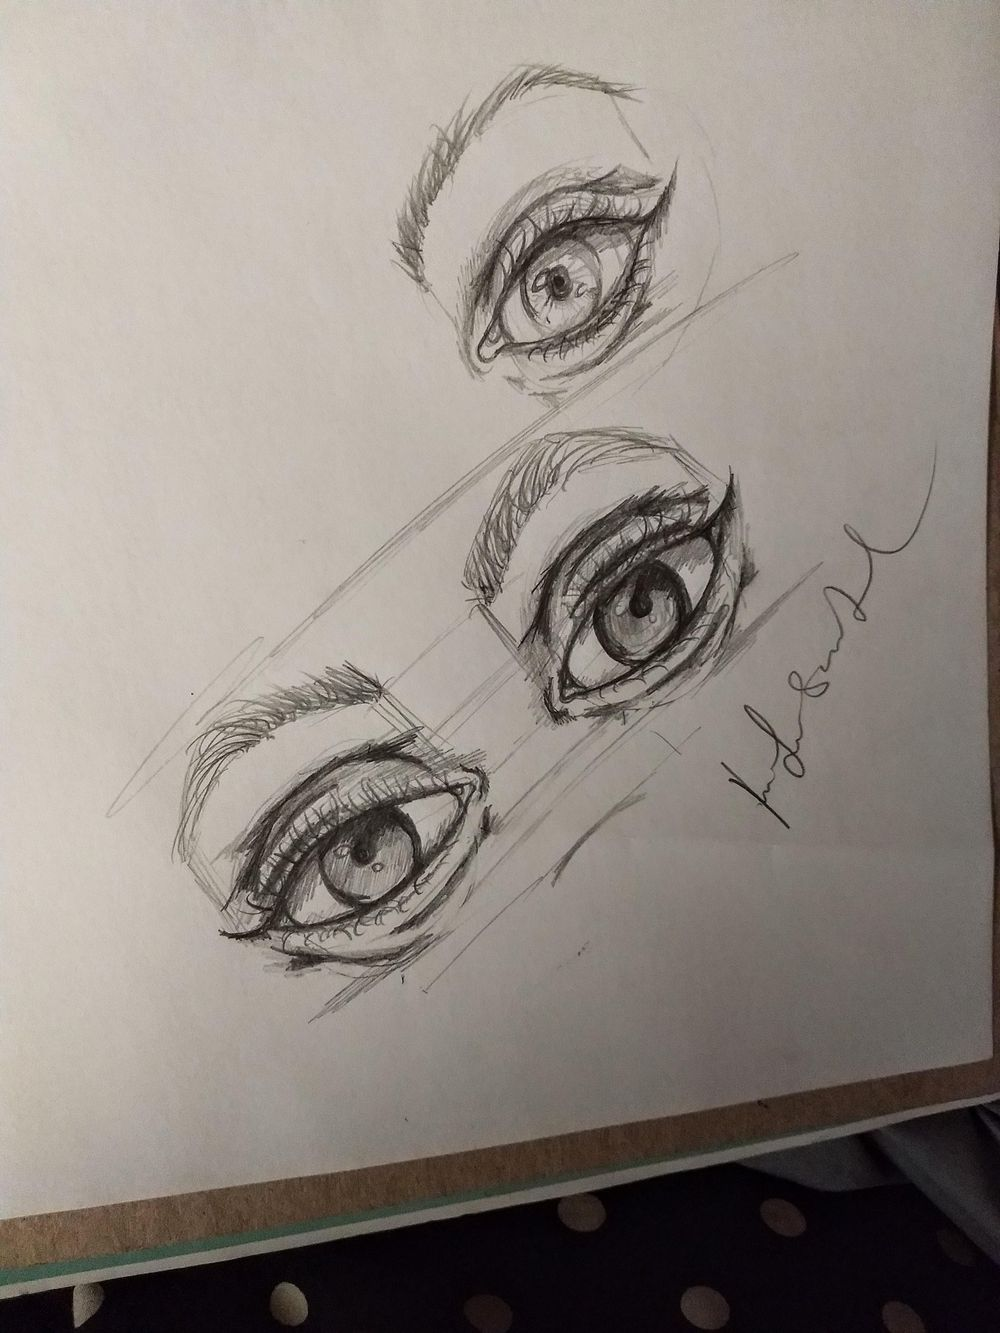 Dem eyes - image 1 - student project